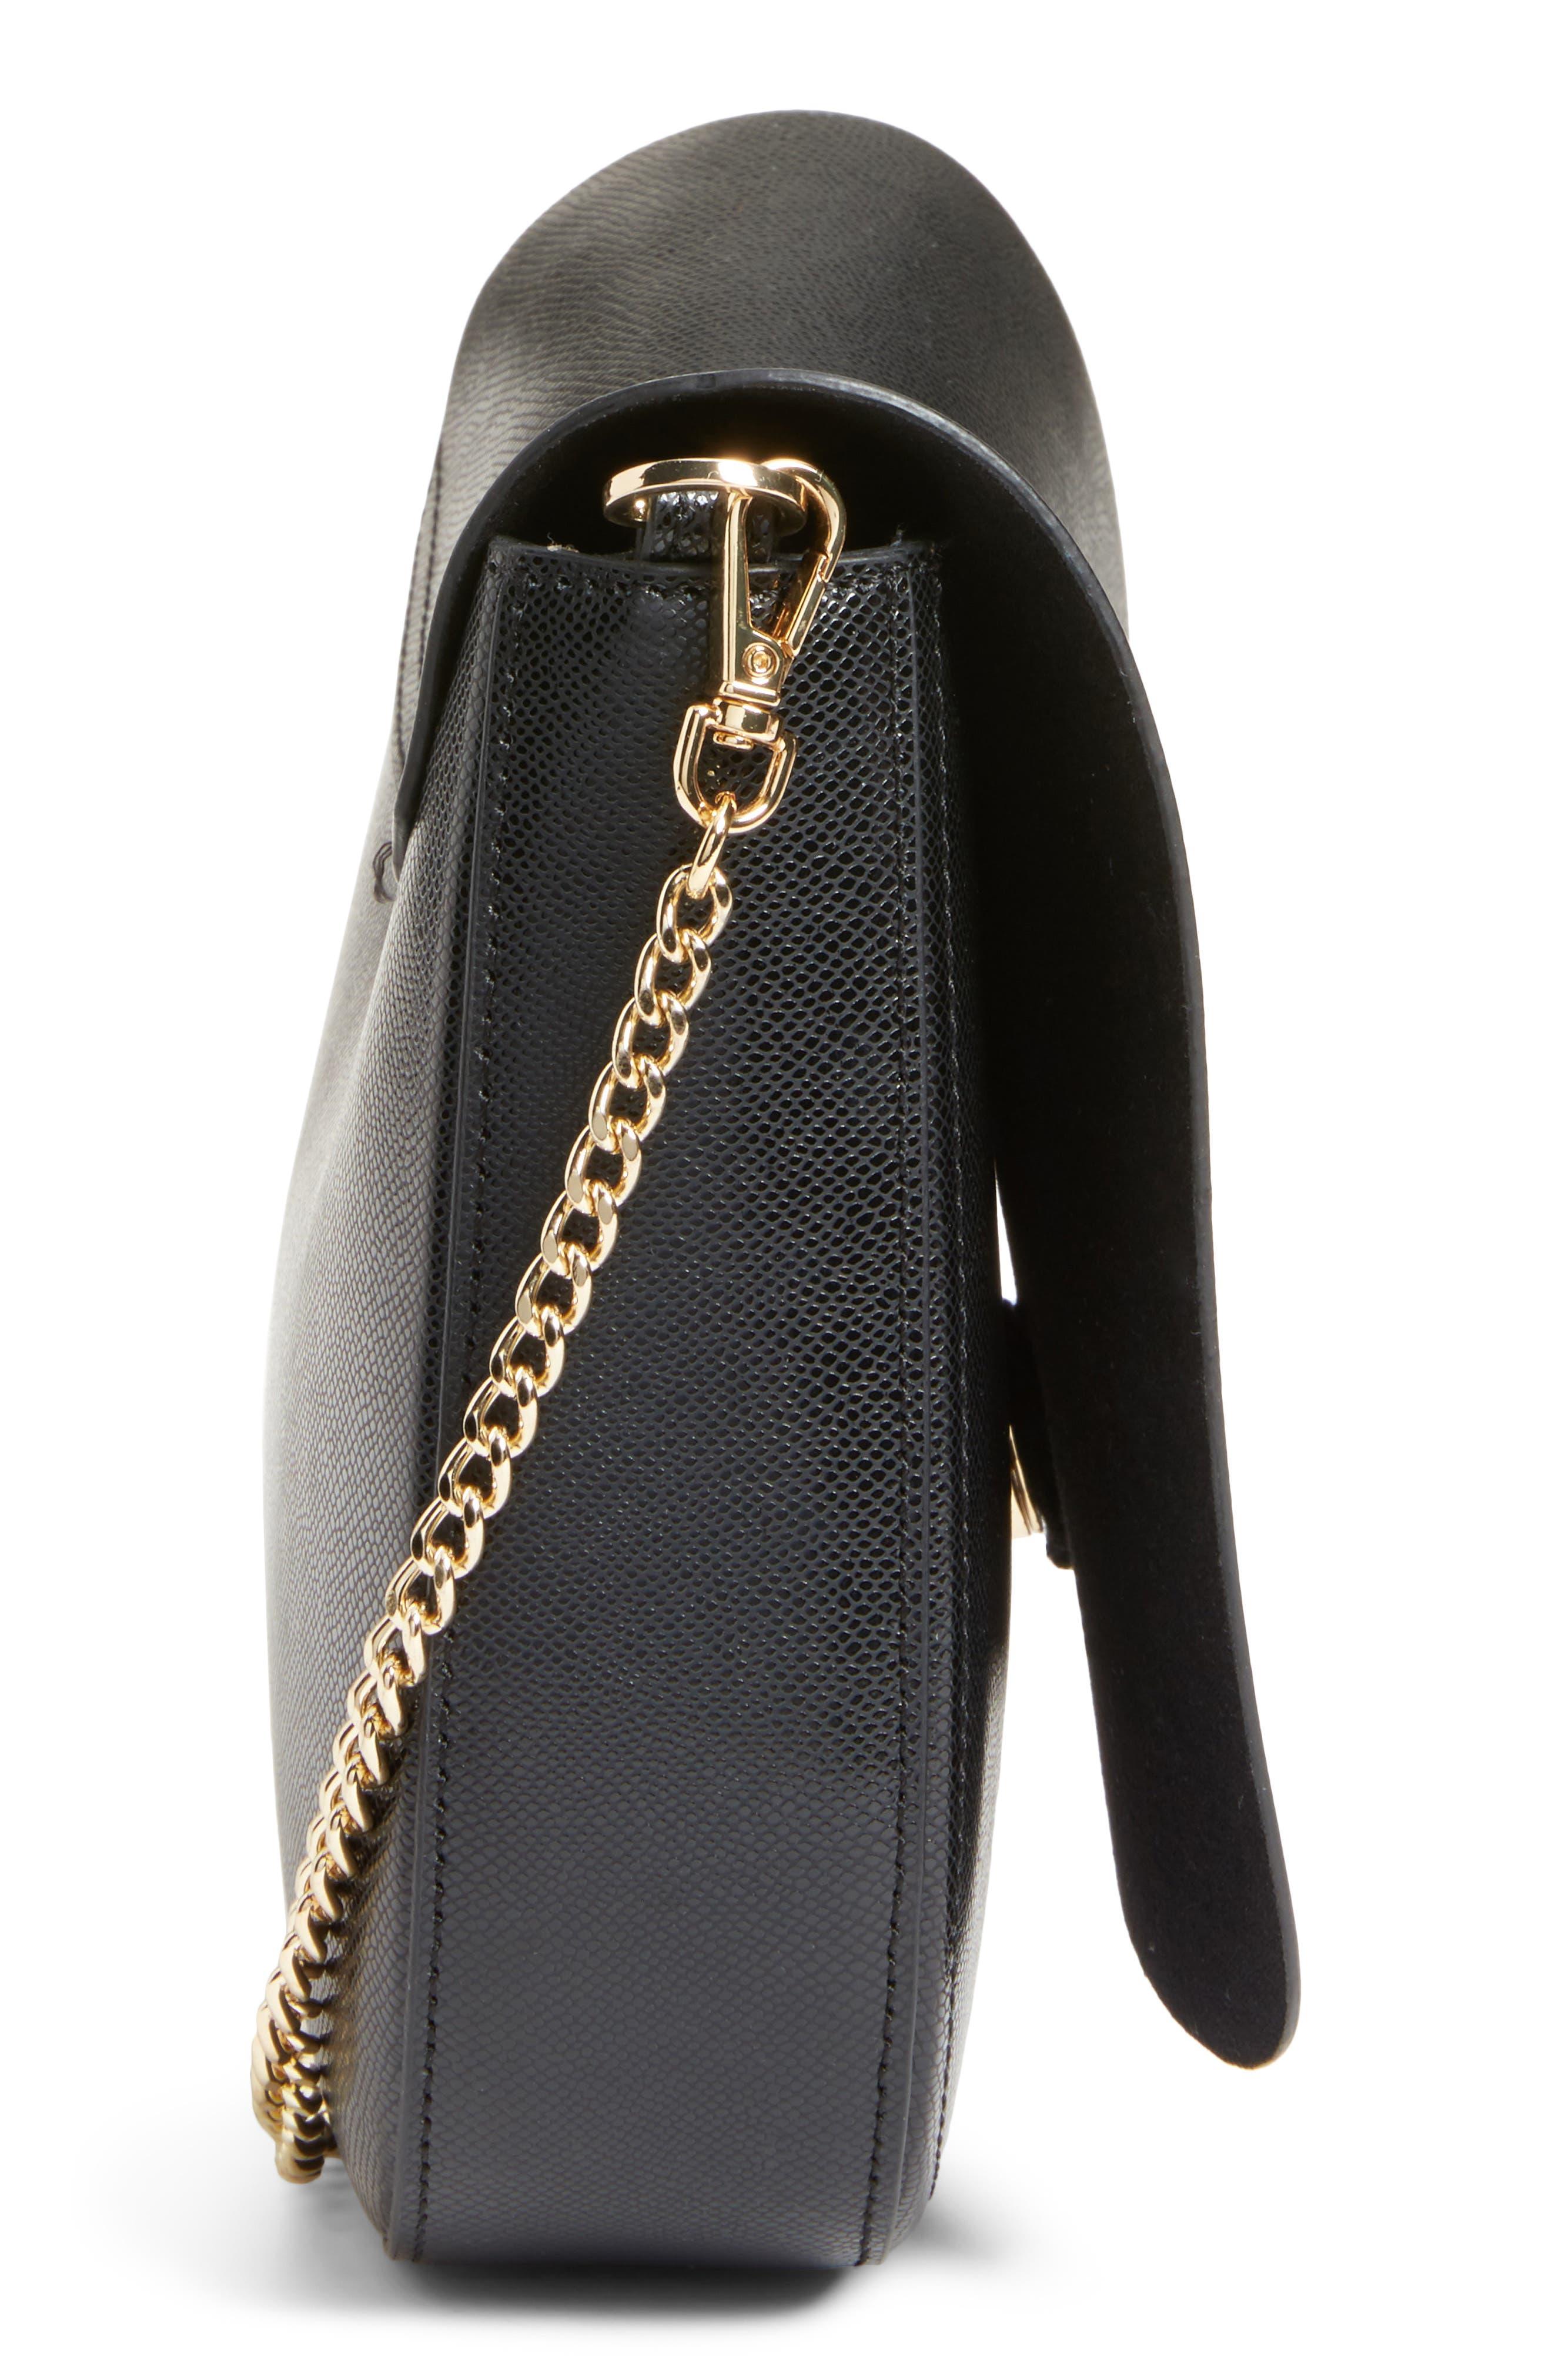 Kittii Cat Leather Crossbody Bag,                             Alternate thumbnail 5, color,                             001